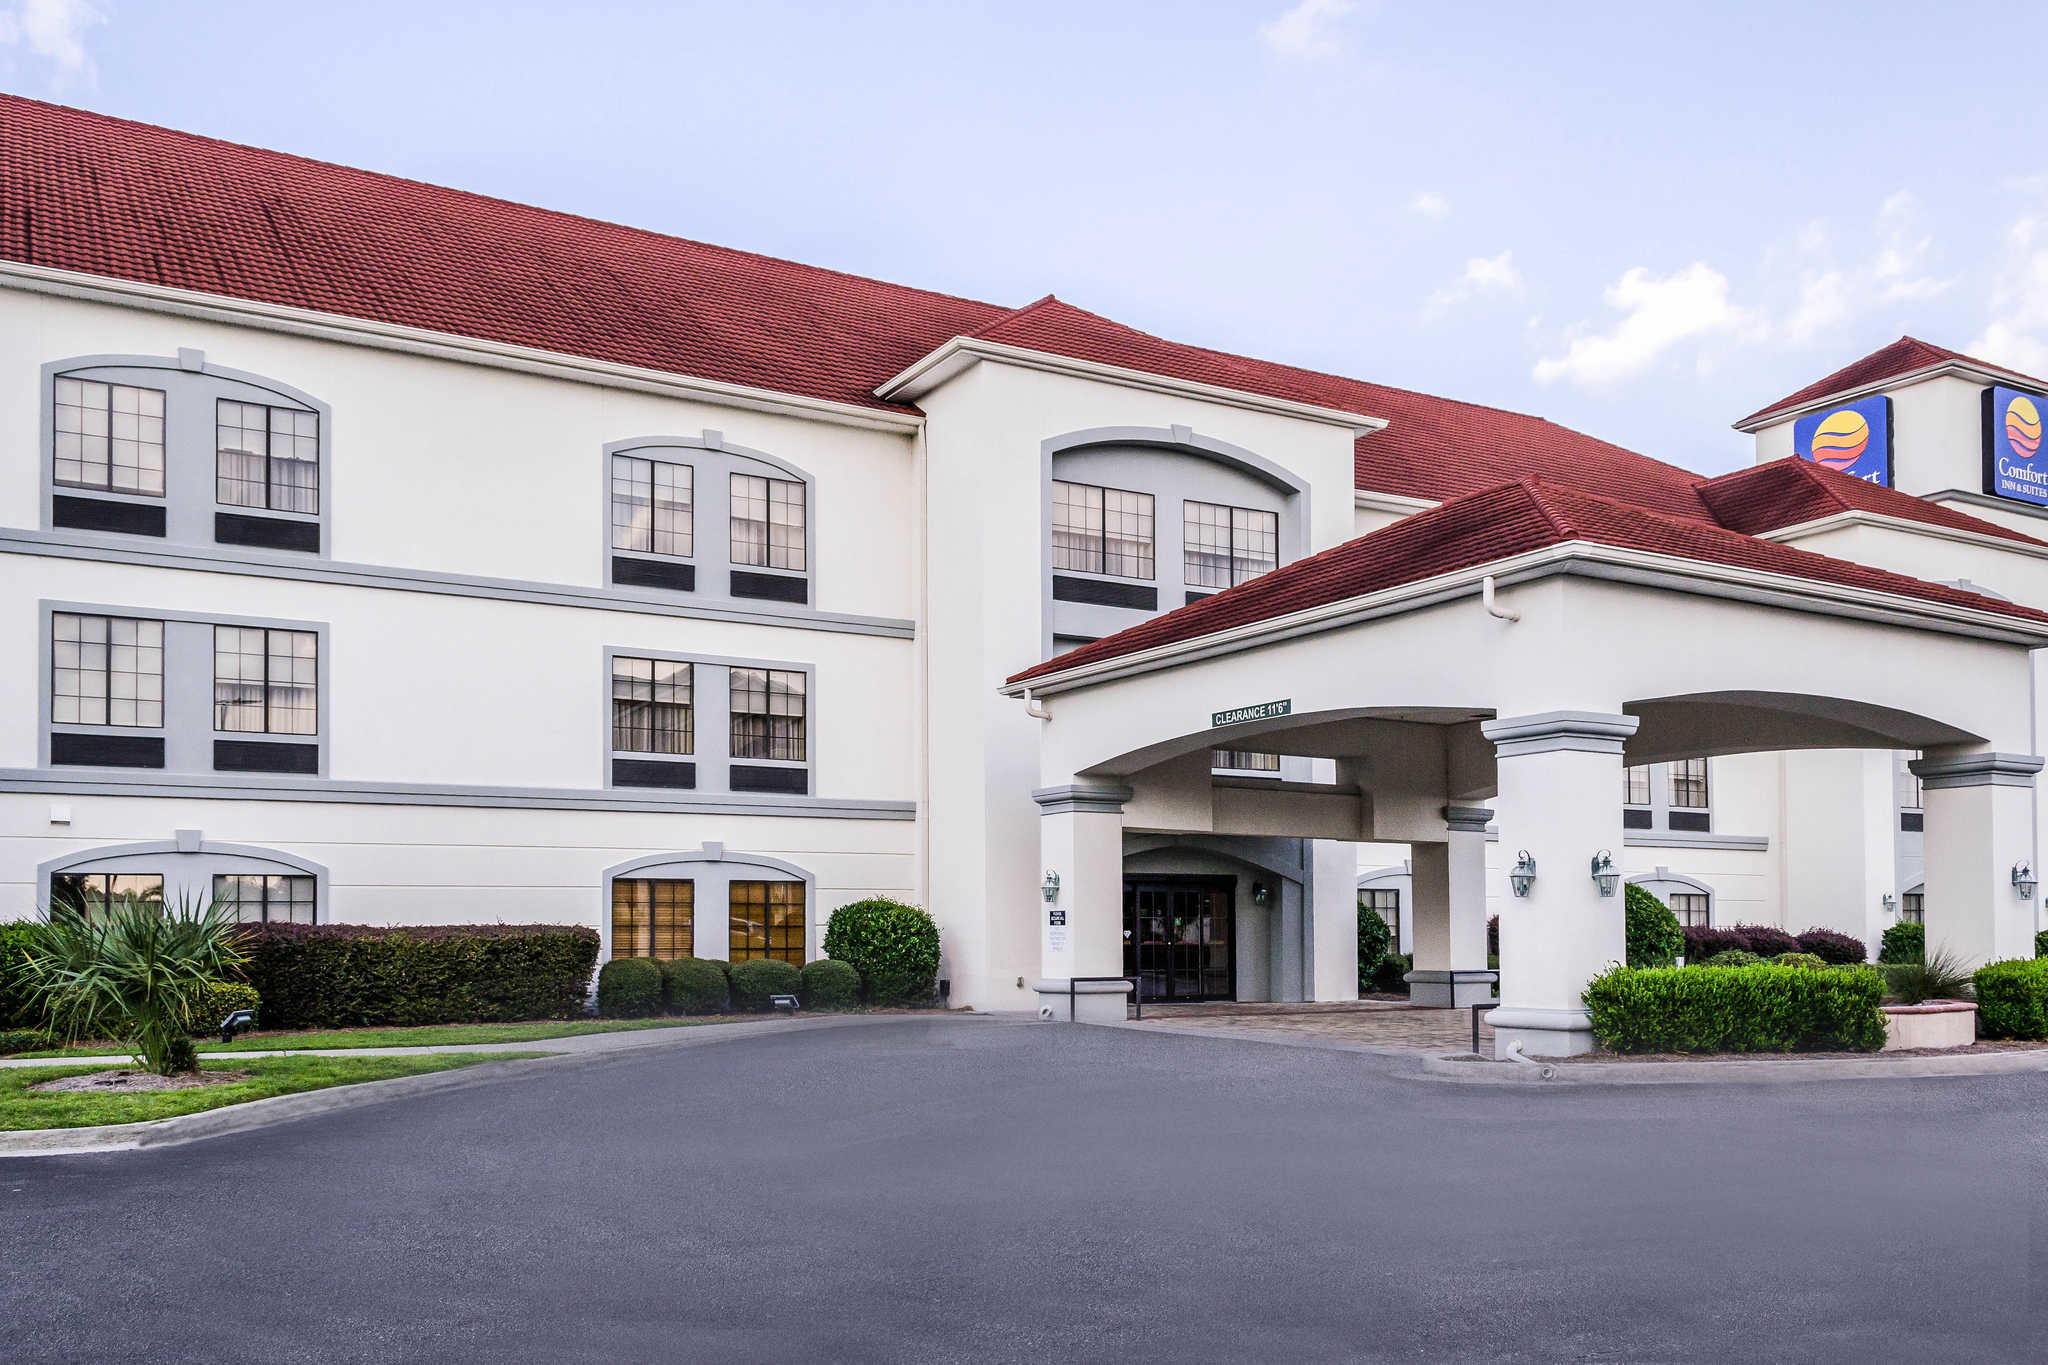 Hotel Rooms Near Savannah Ga